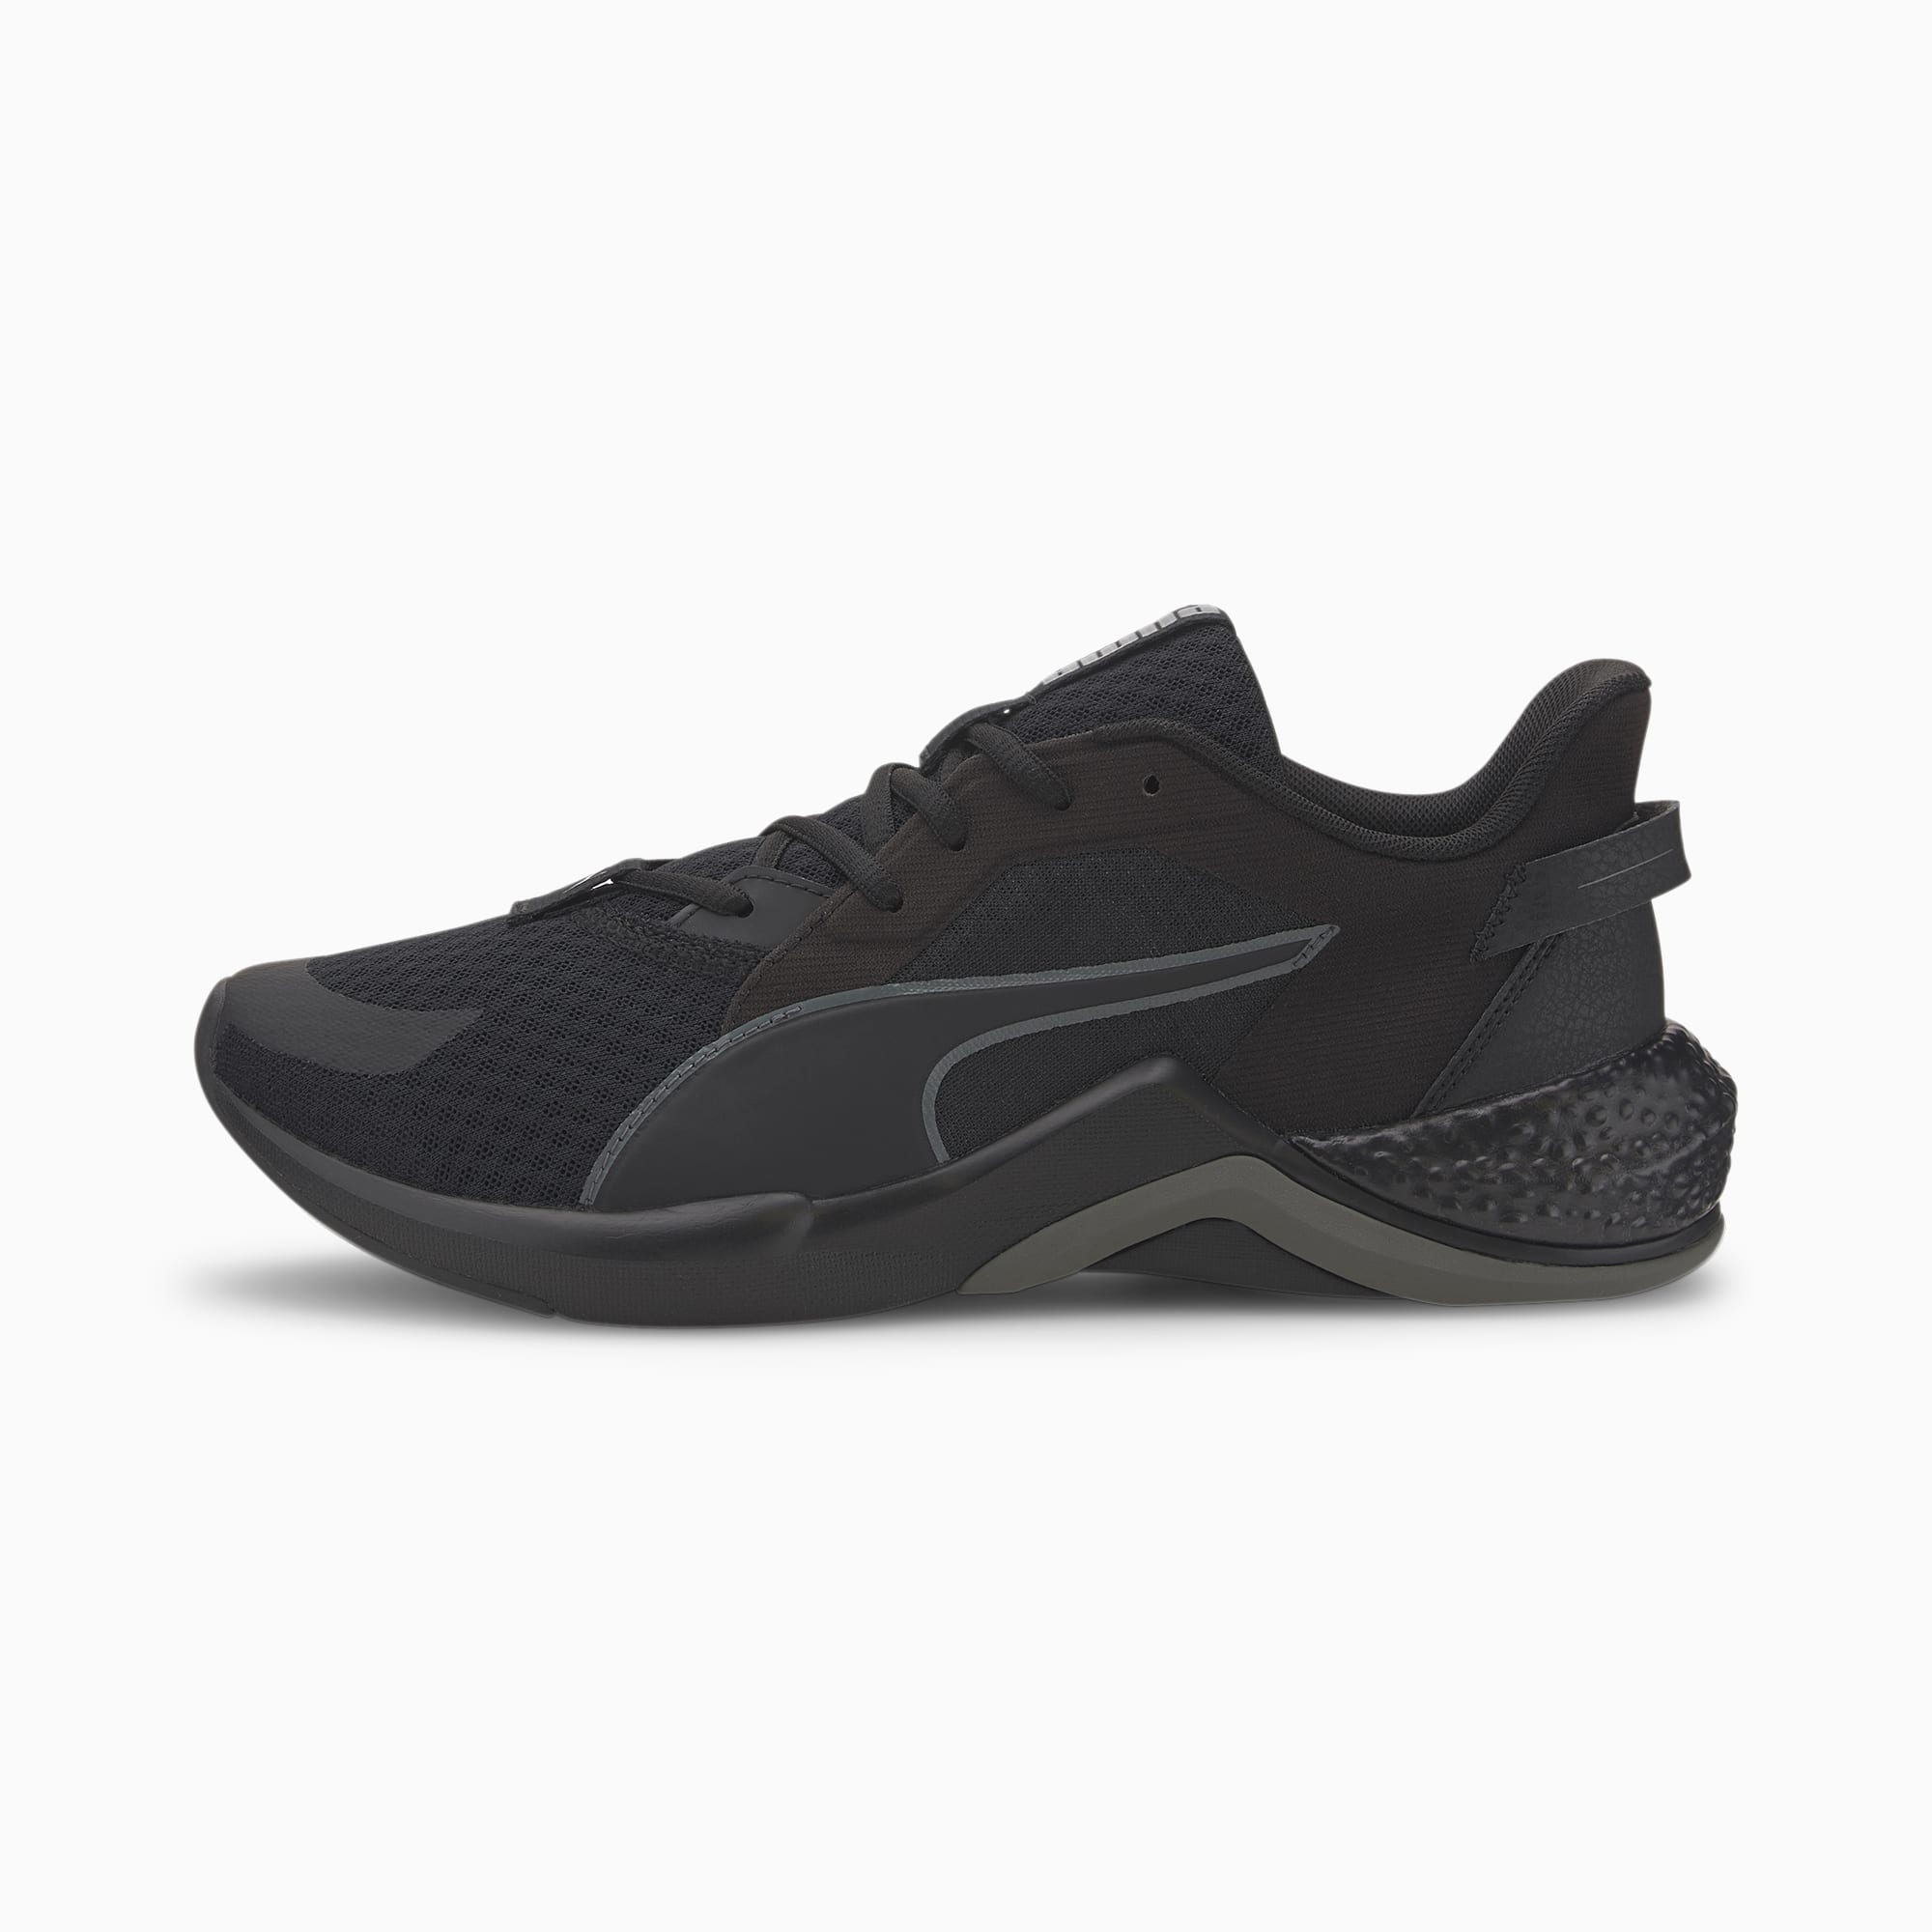 Zapatos para correr HYBRID NX Ozone para hombre